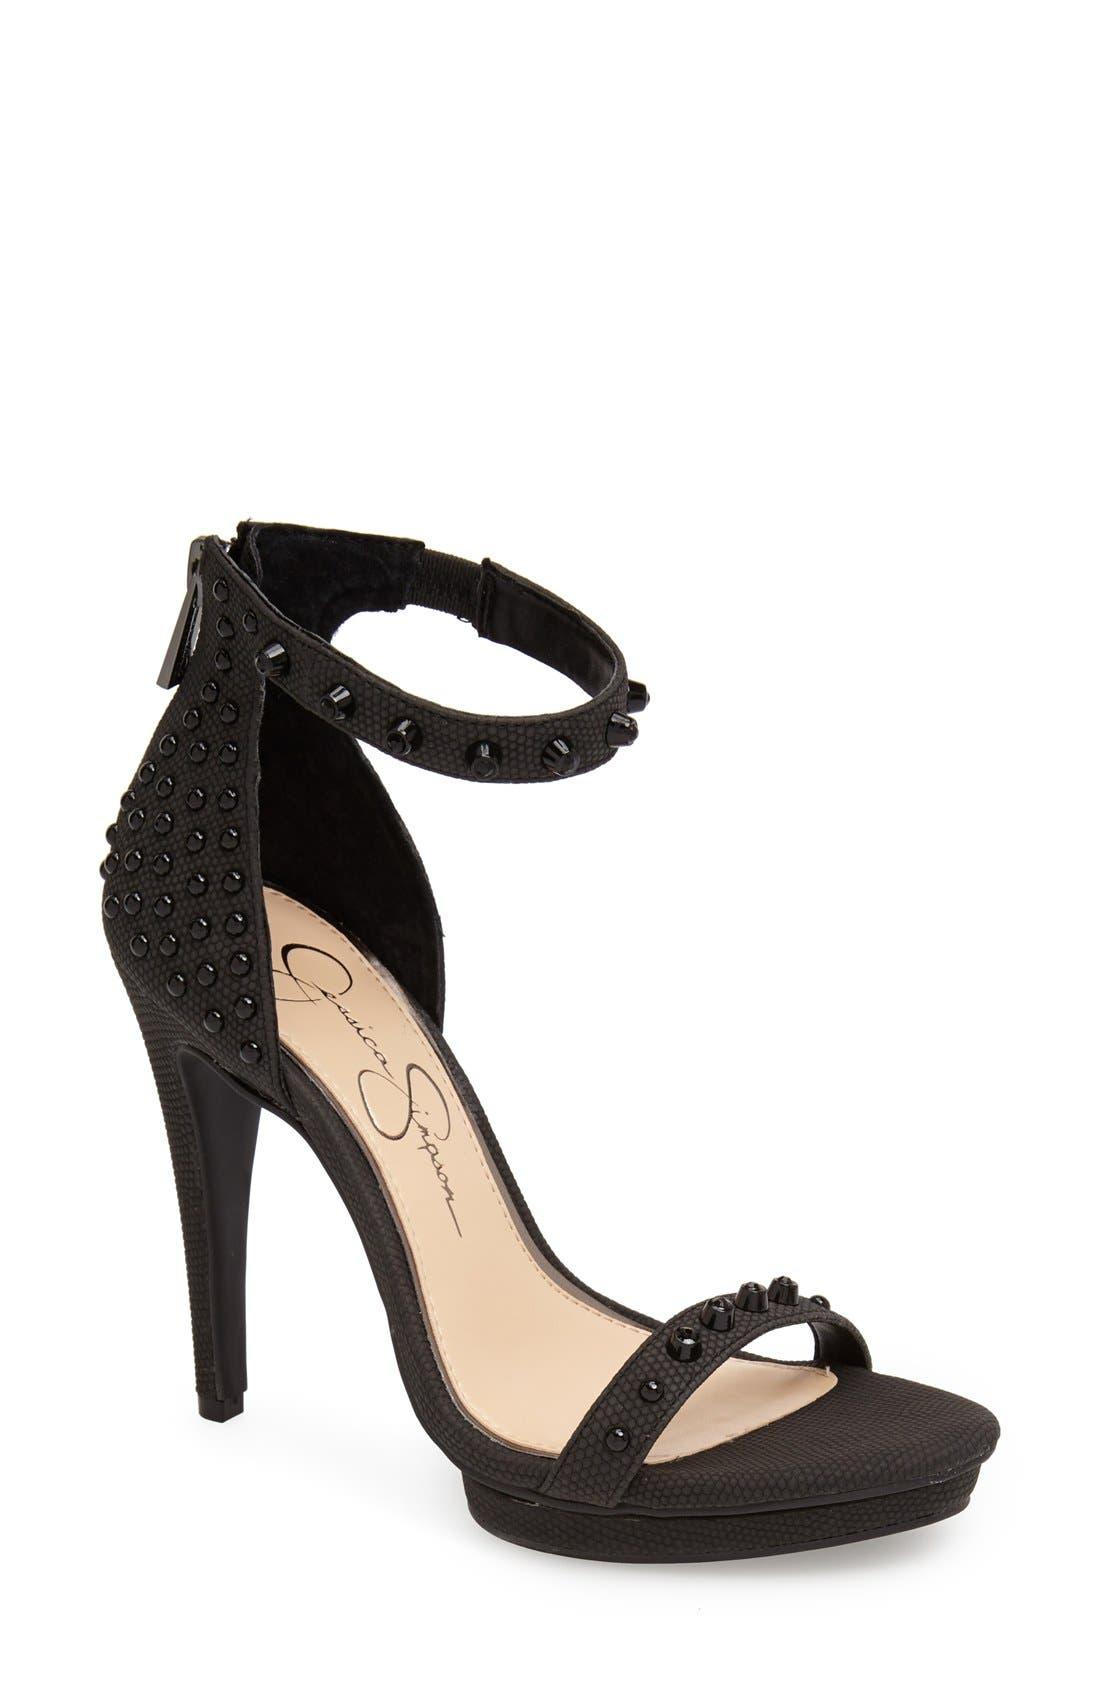 Alternate Image 1 Selected - Jessica Simpson 'Faralie' Sandal (Women)